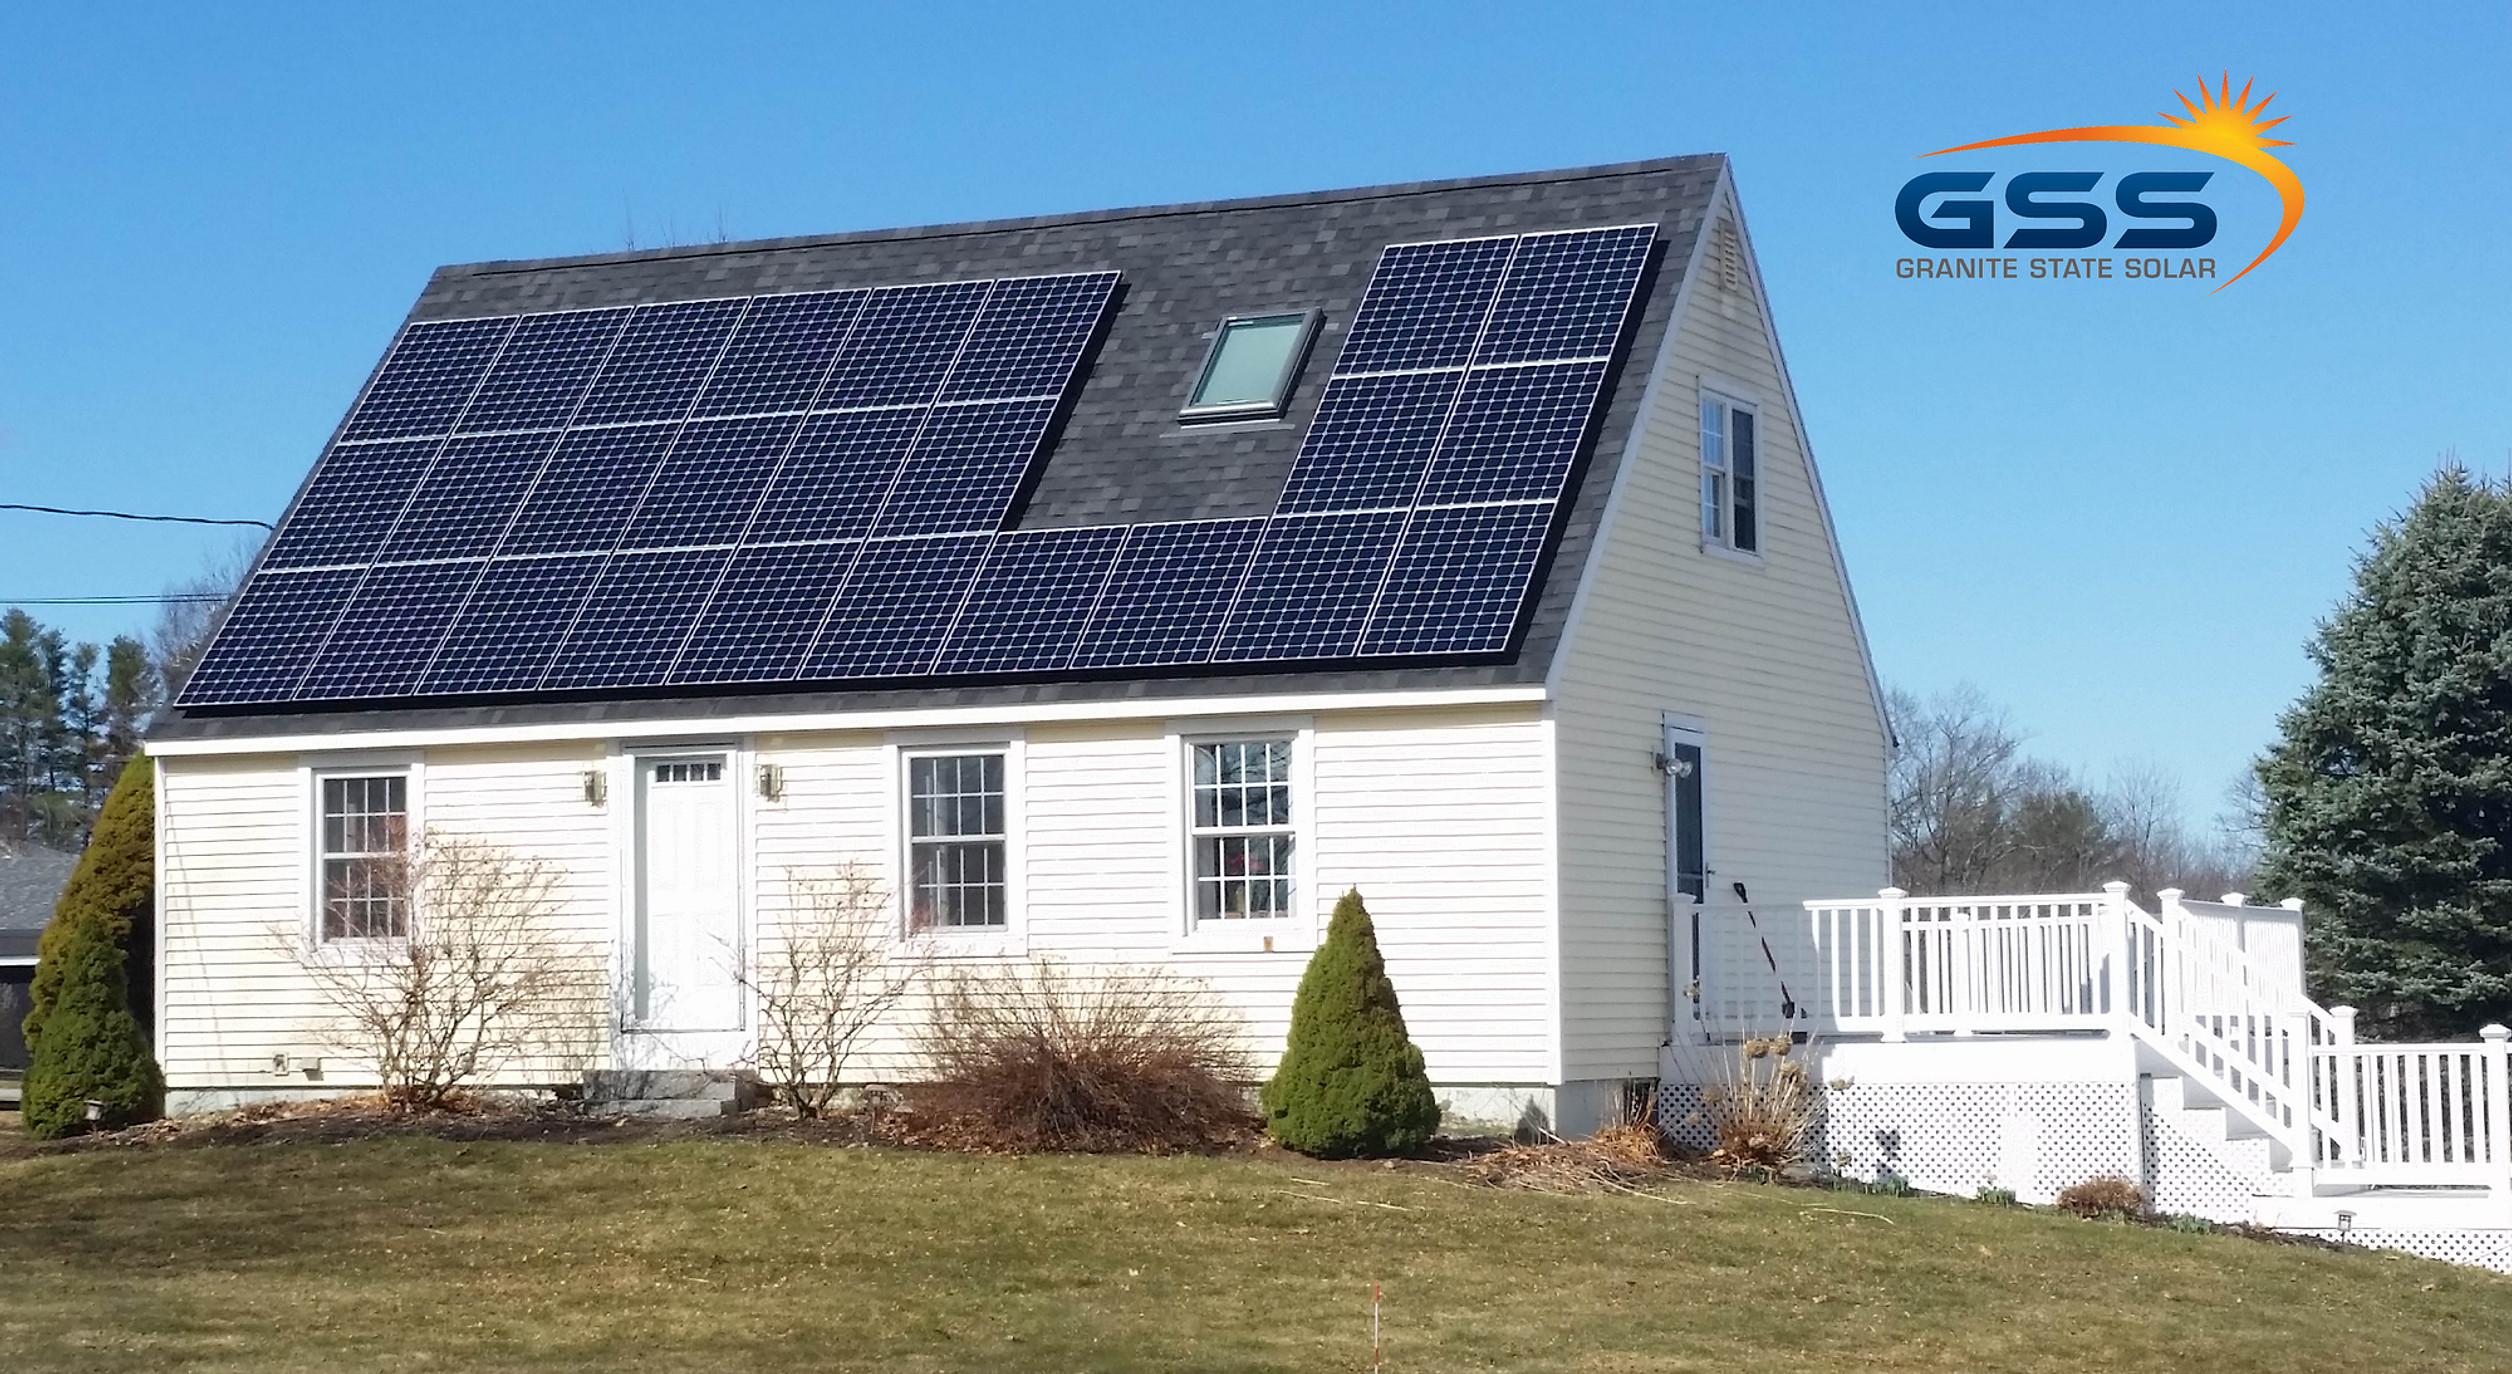 26 solar panel roof array